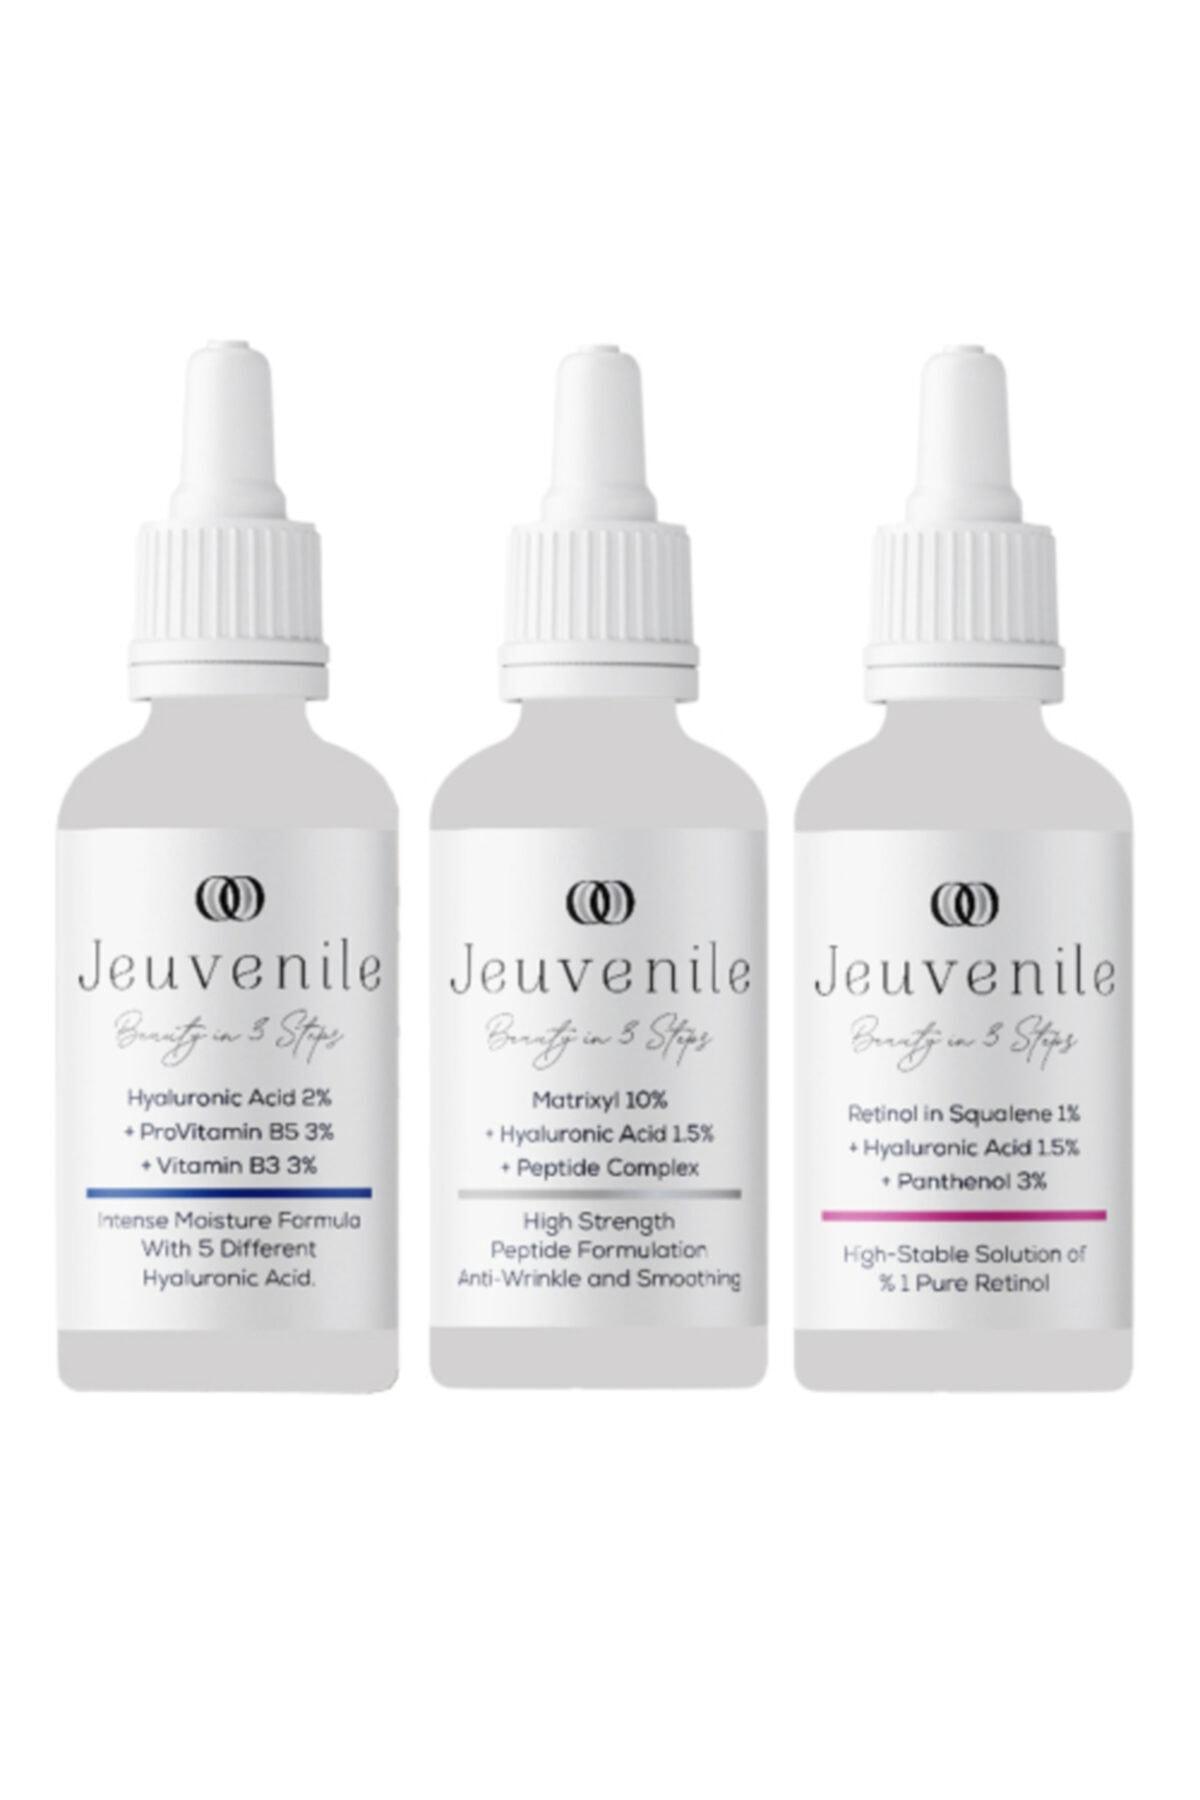 Jeuvenile Anti-age 3'lü Serum Seti - Hyaluronic Acid %2 + Matrixyl %10 + Retinol In Squalene %1 1